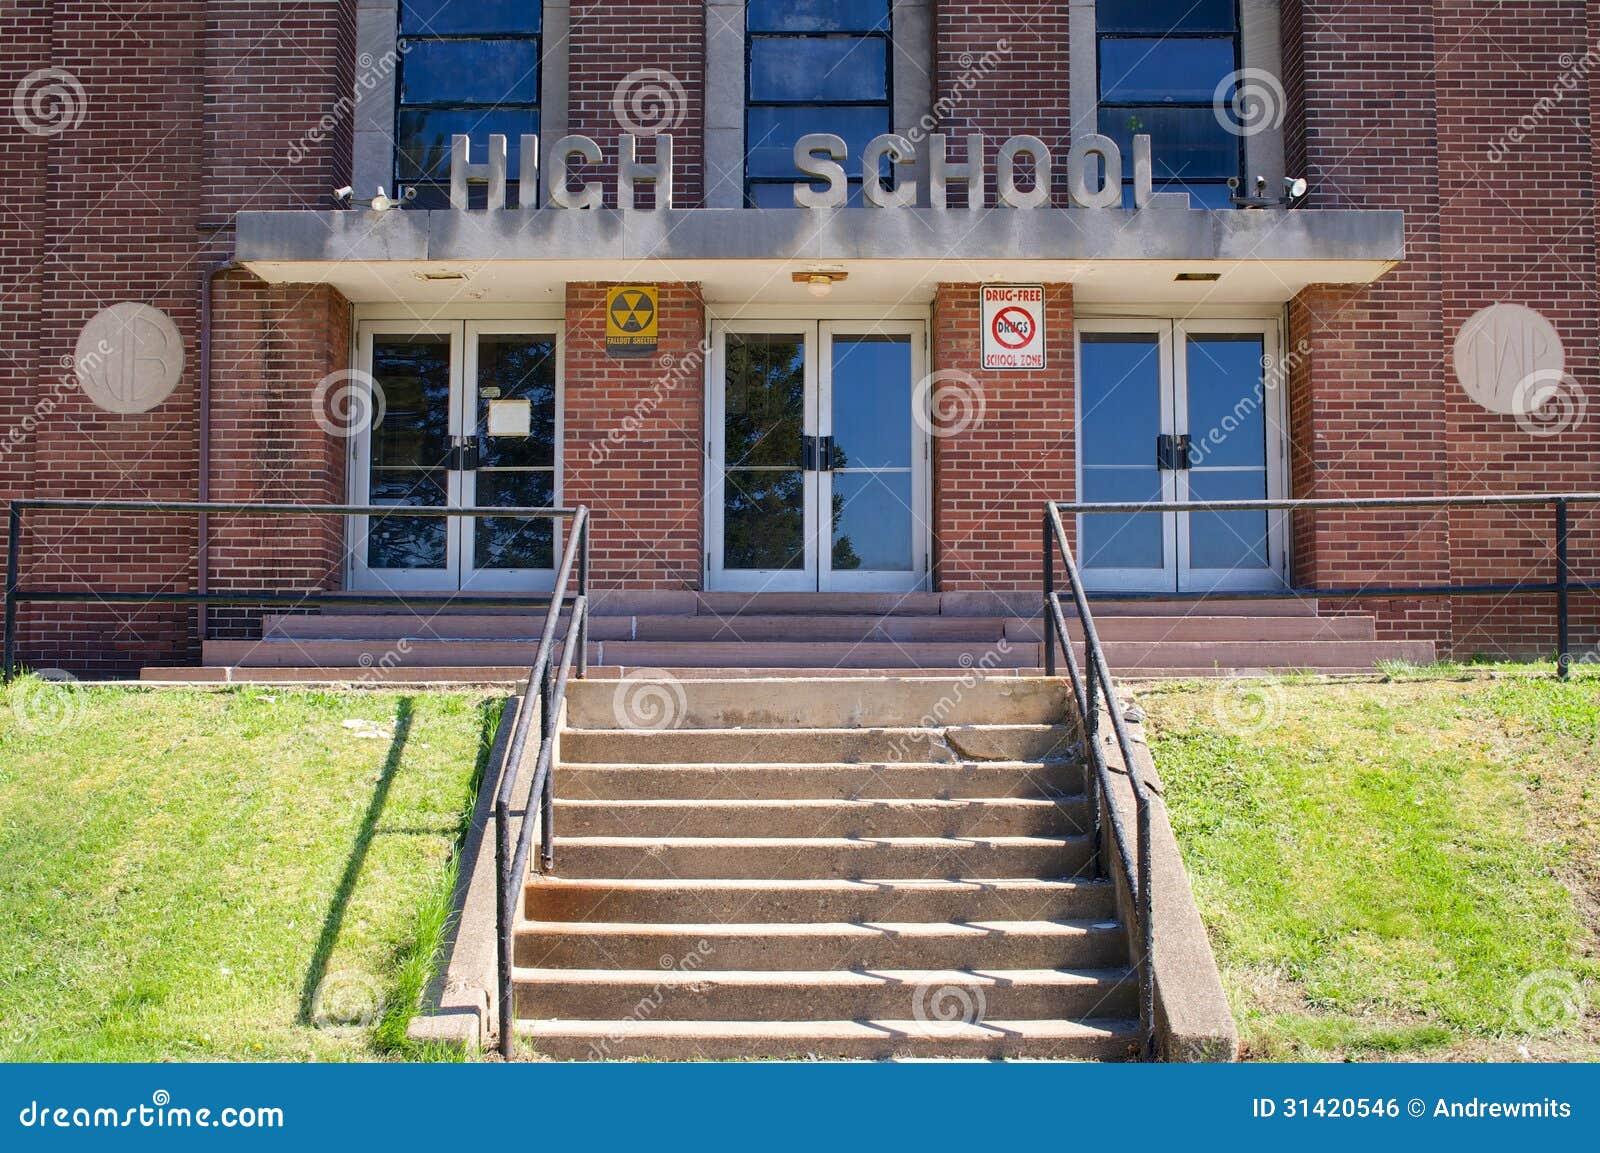 School Entrance Doors : Cold war era high school entrance stock photo image